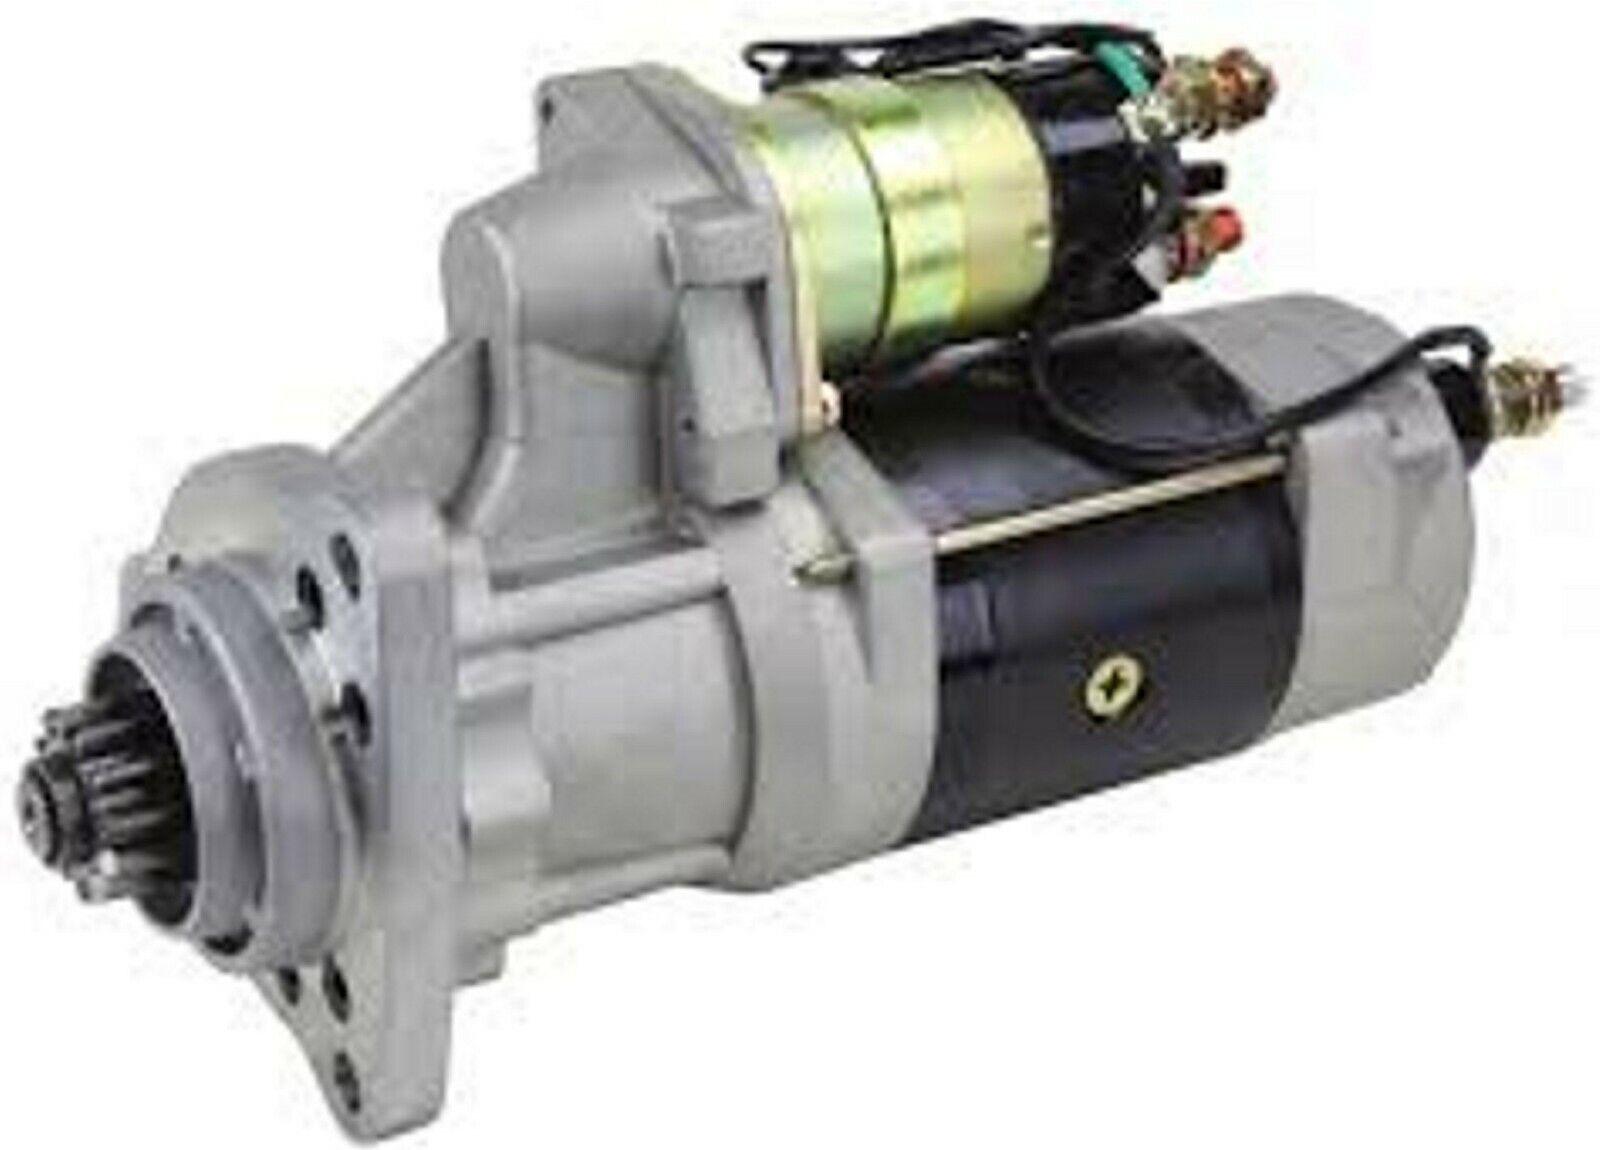 Cummings Electrical Starter Motor 24 Volts